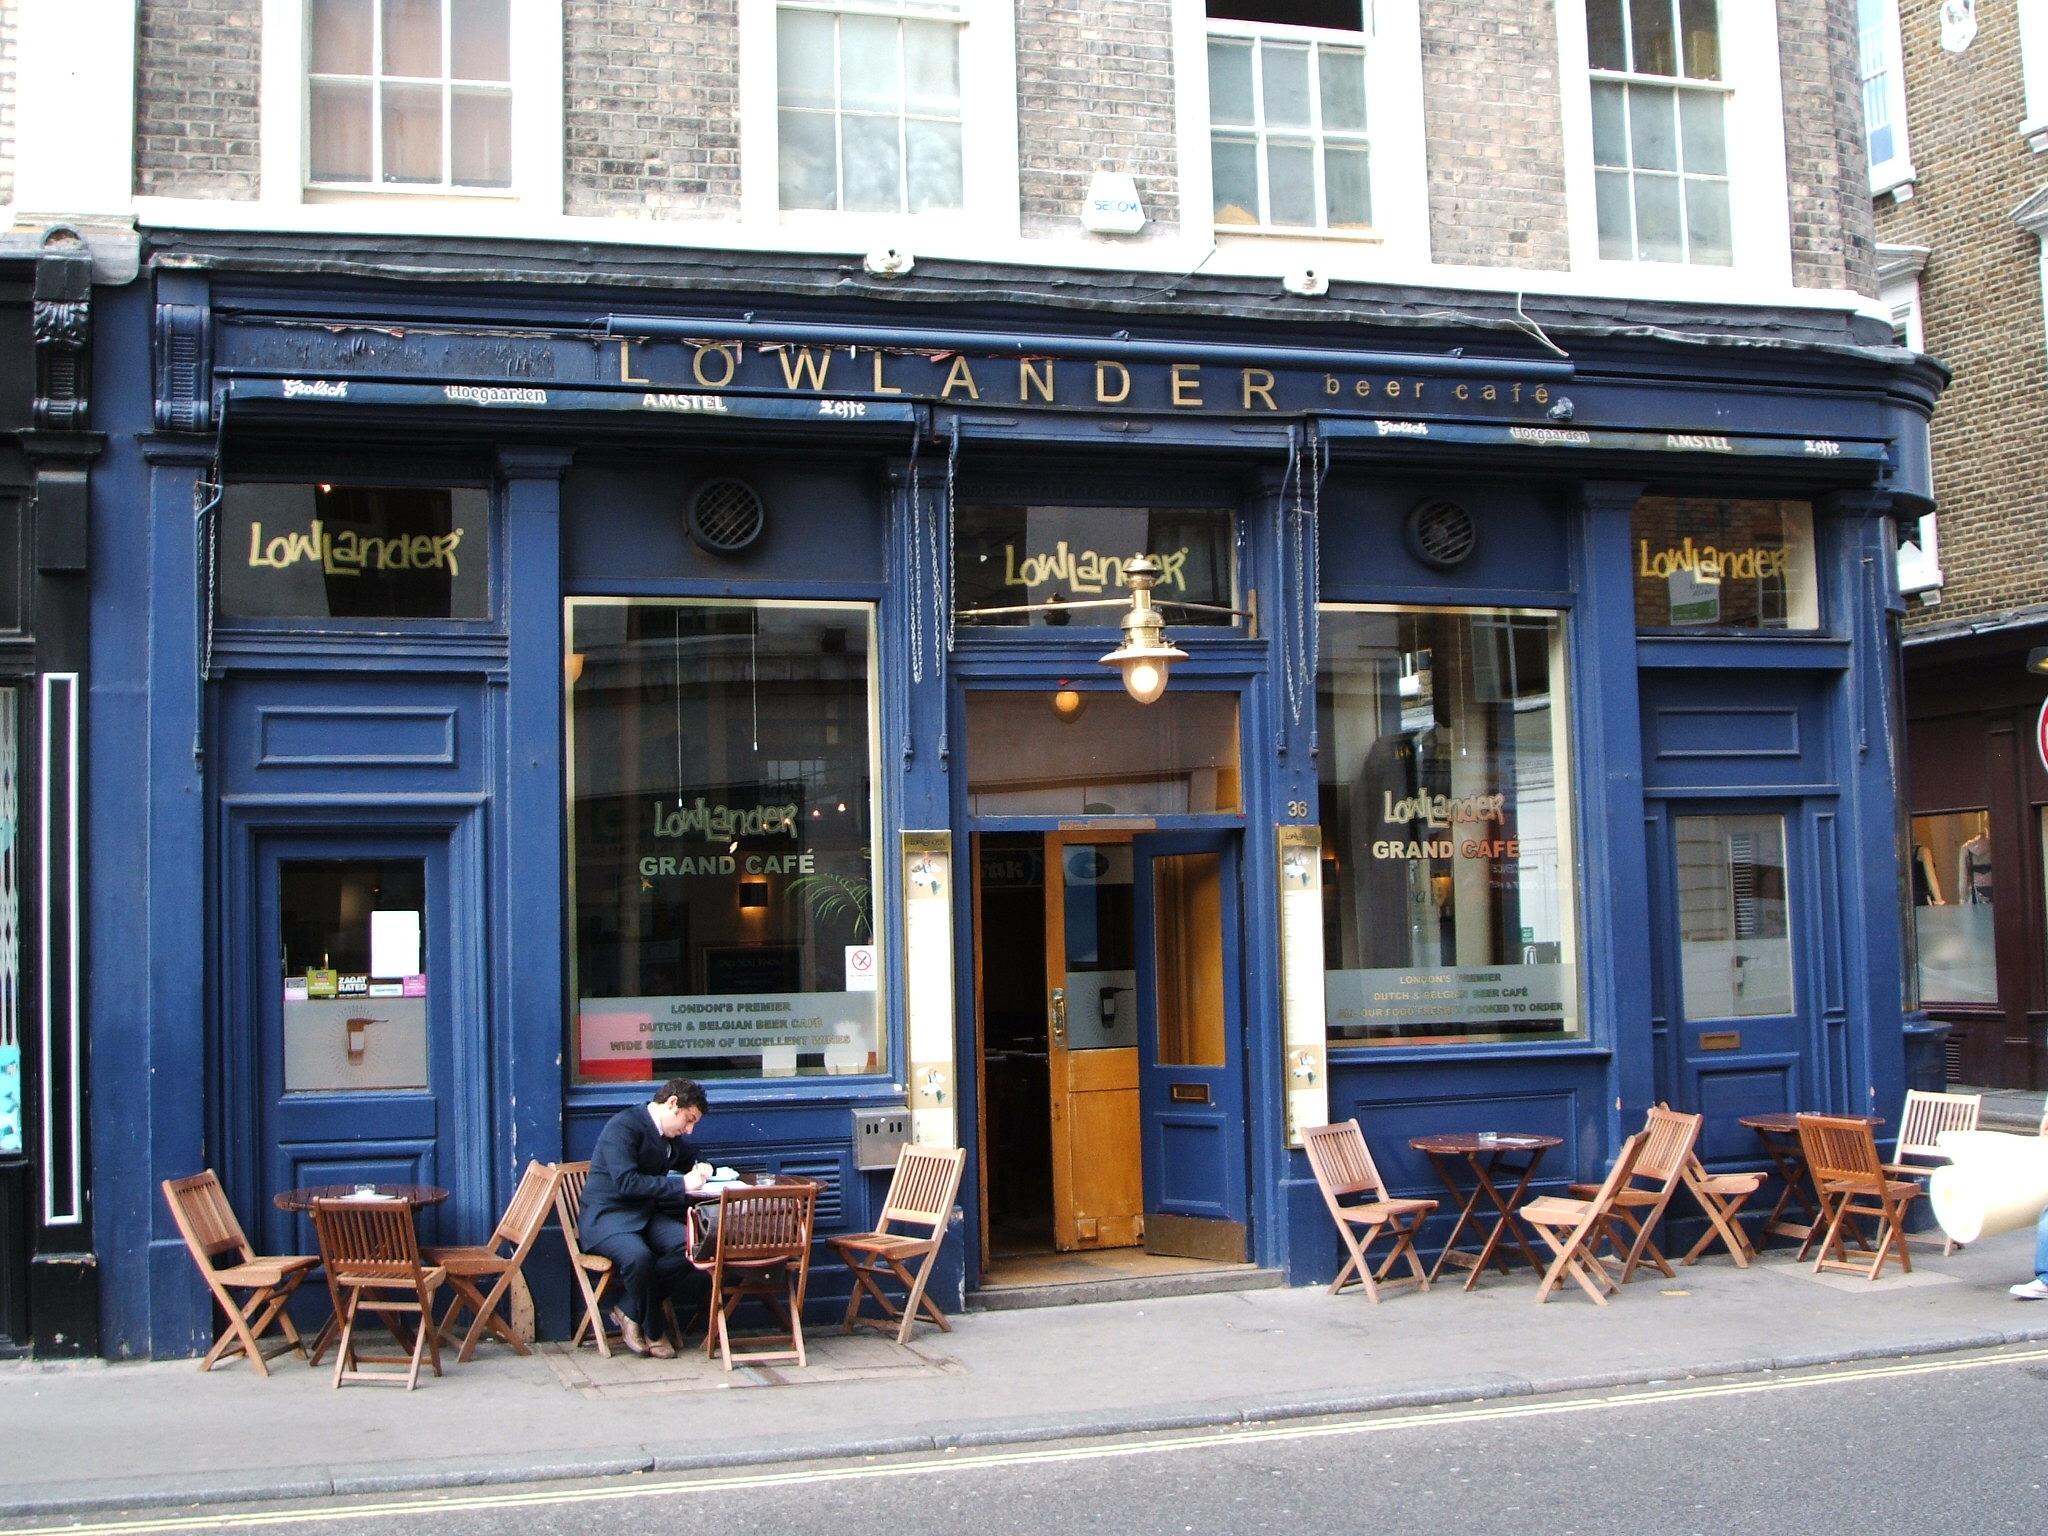 Lowlander Grand Café London